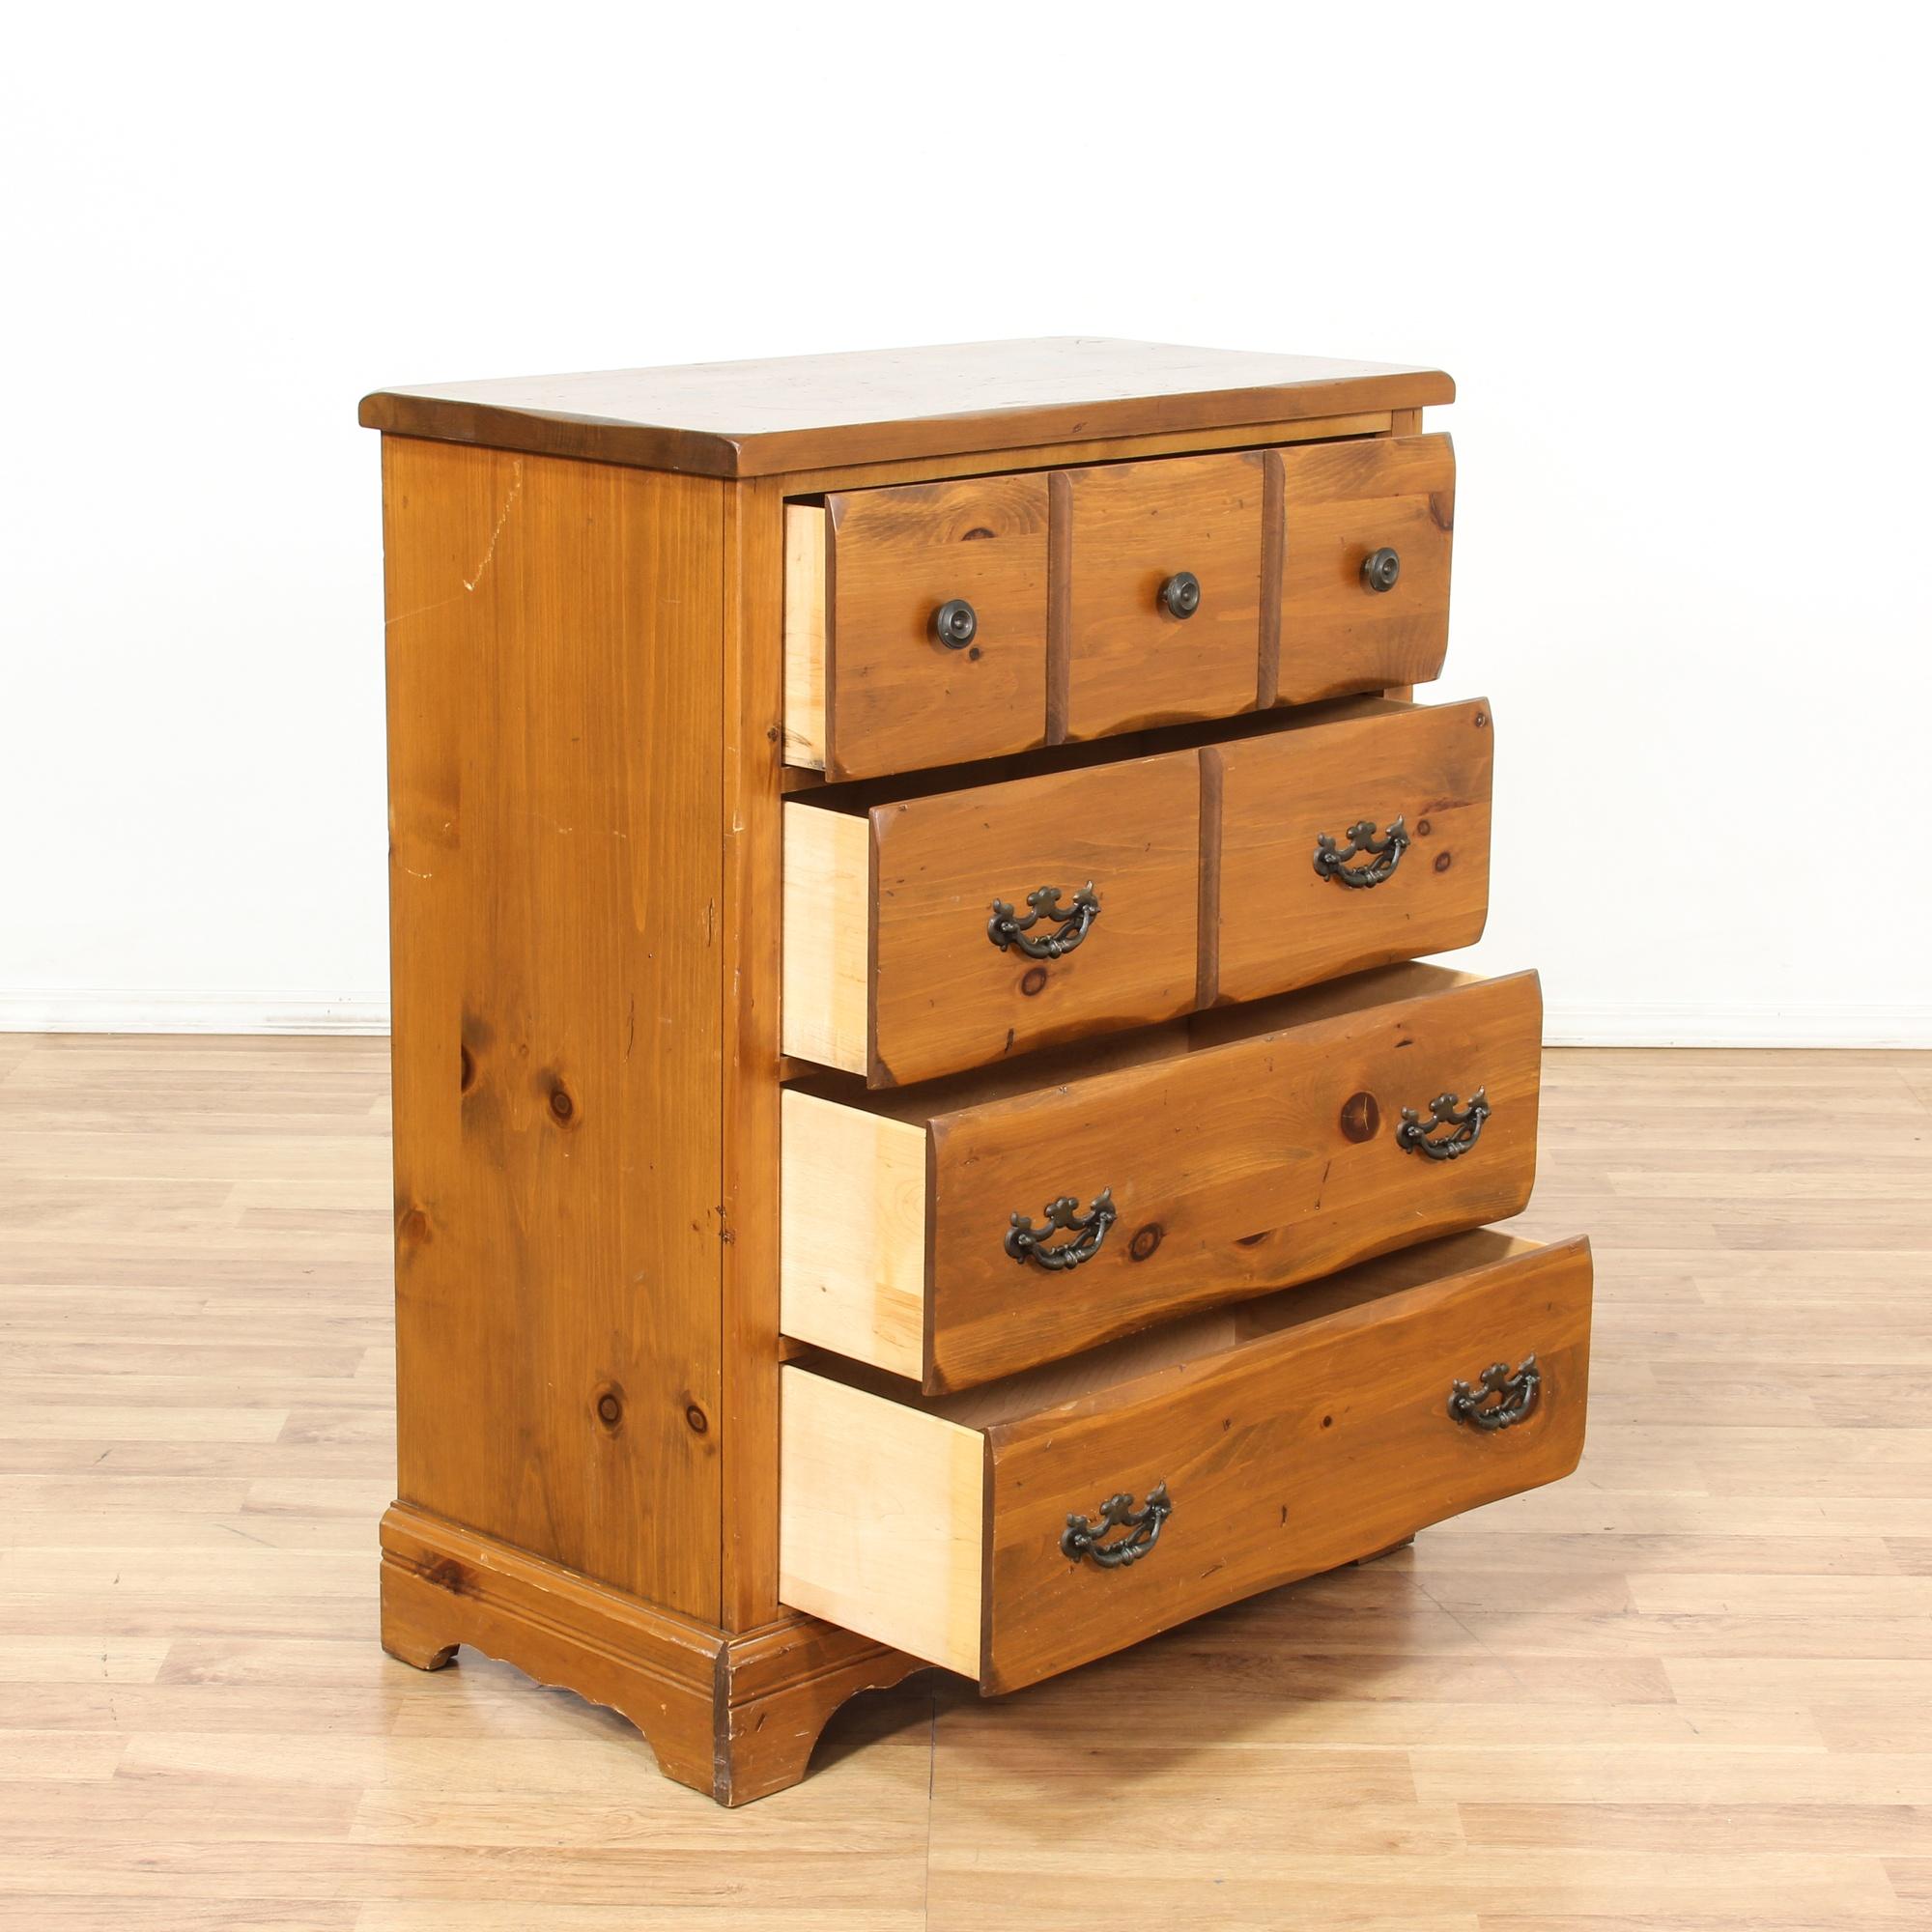 Little Folks Pine Chest Of Drawers Loveseat Vintage Furniture San Diego Los Angeles